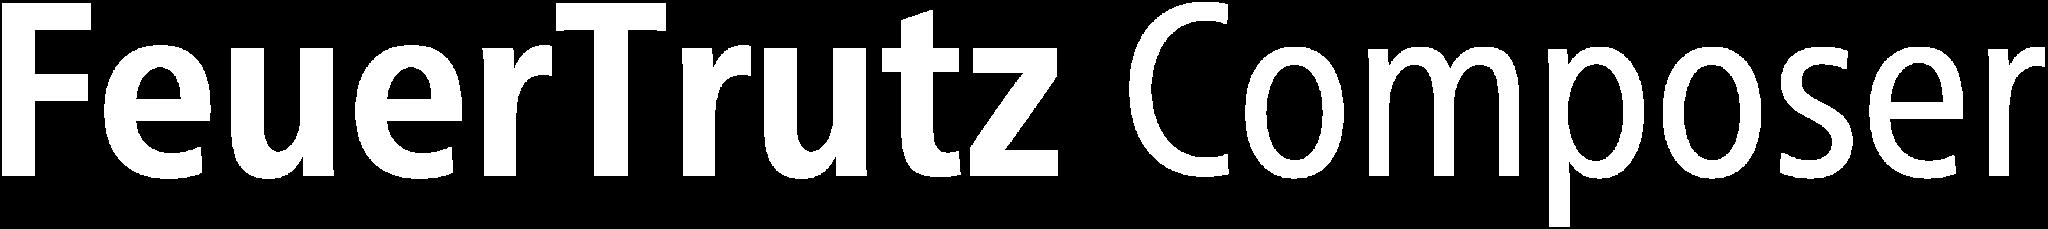 Logo FeuerTrutz Composer